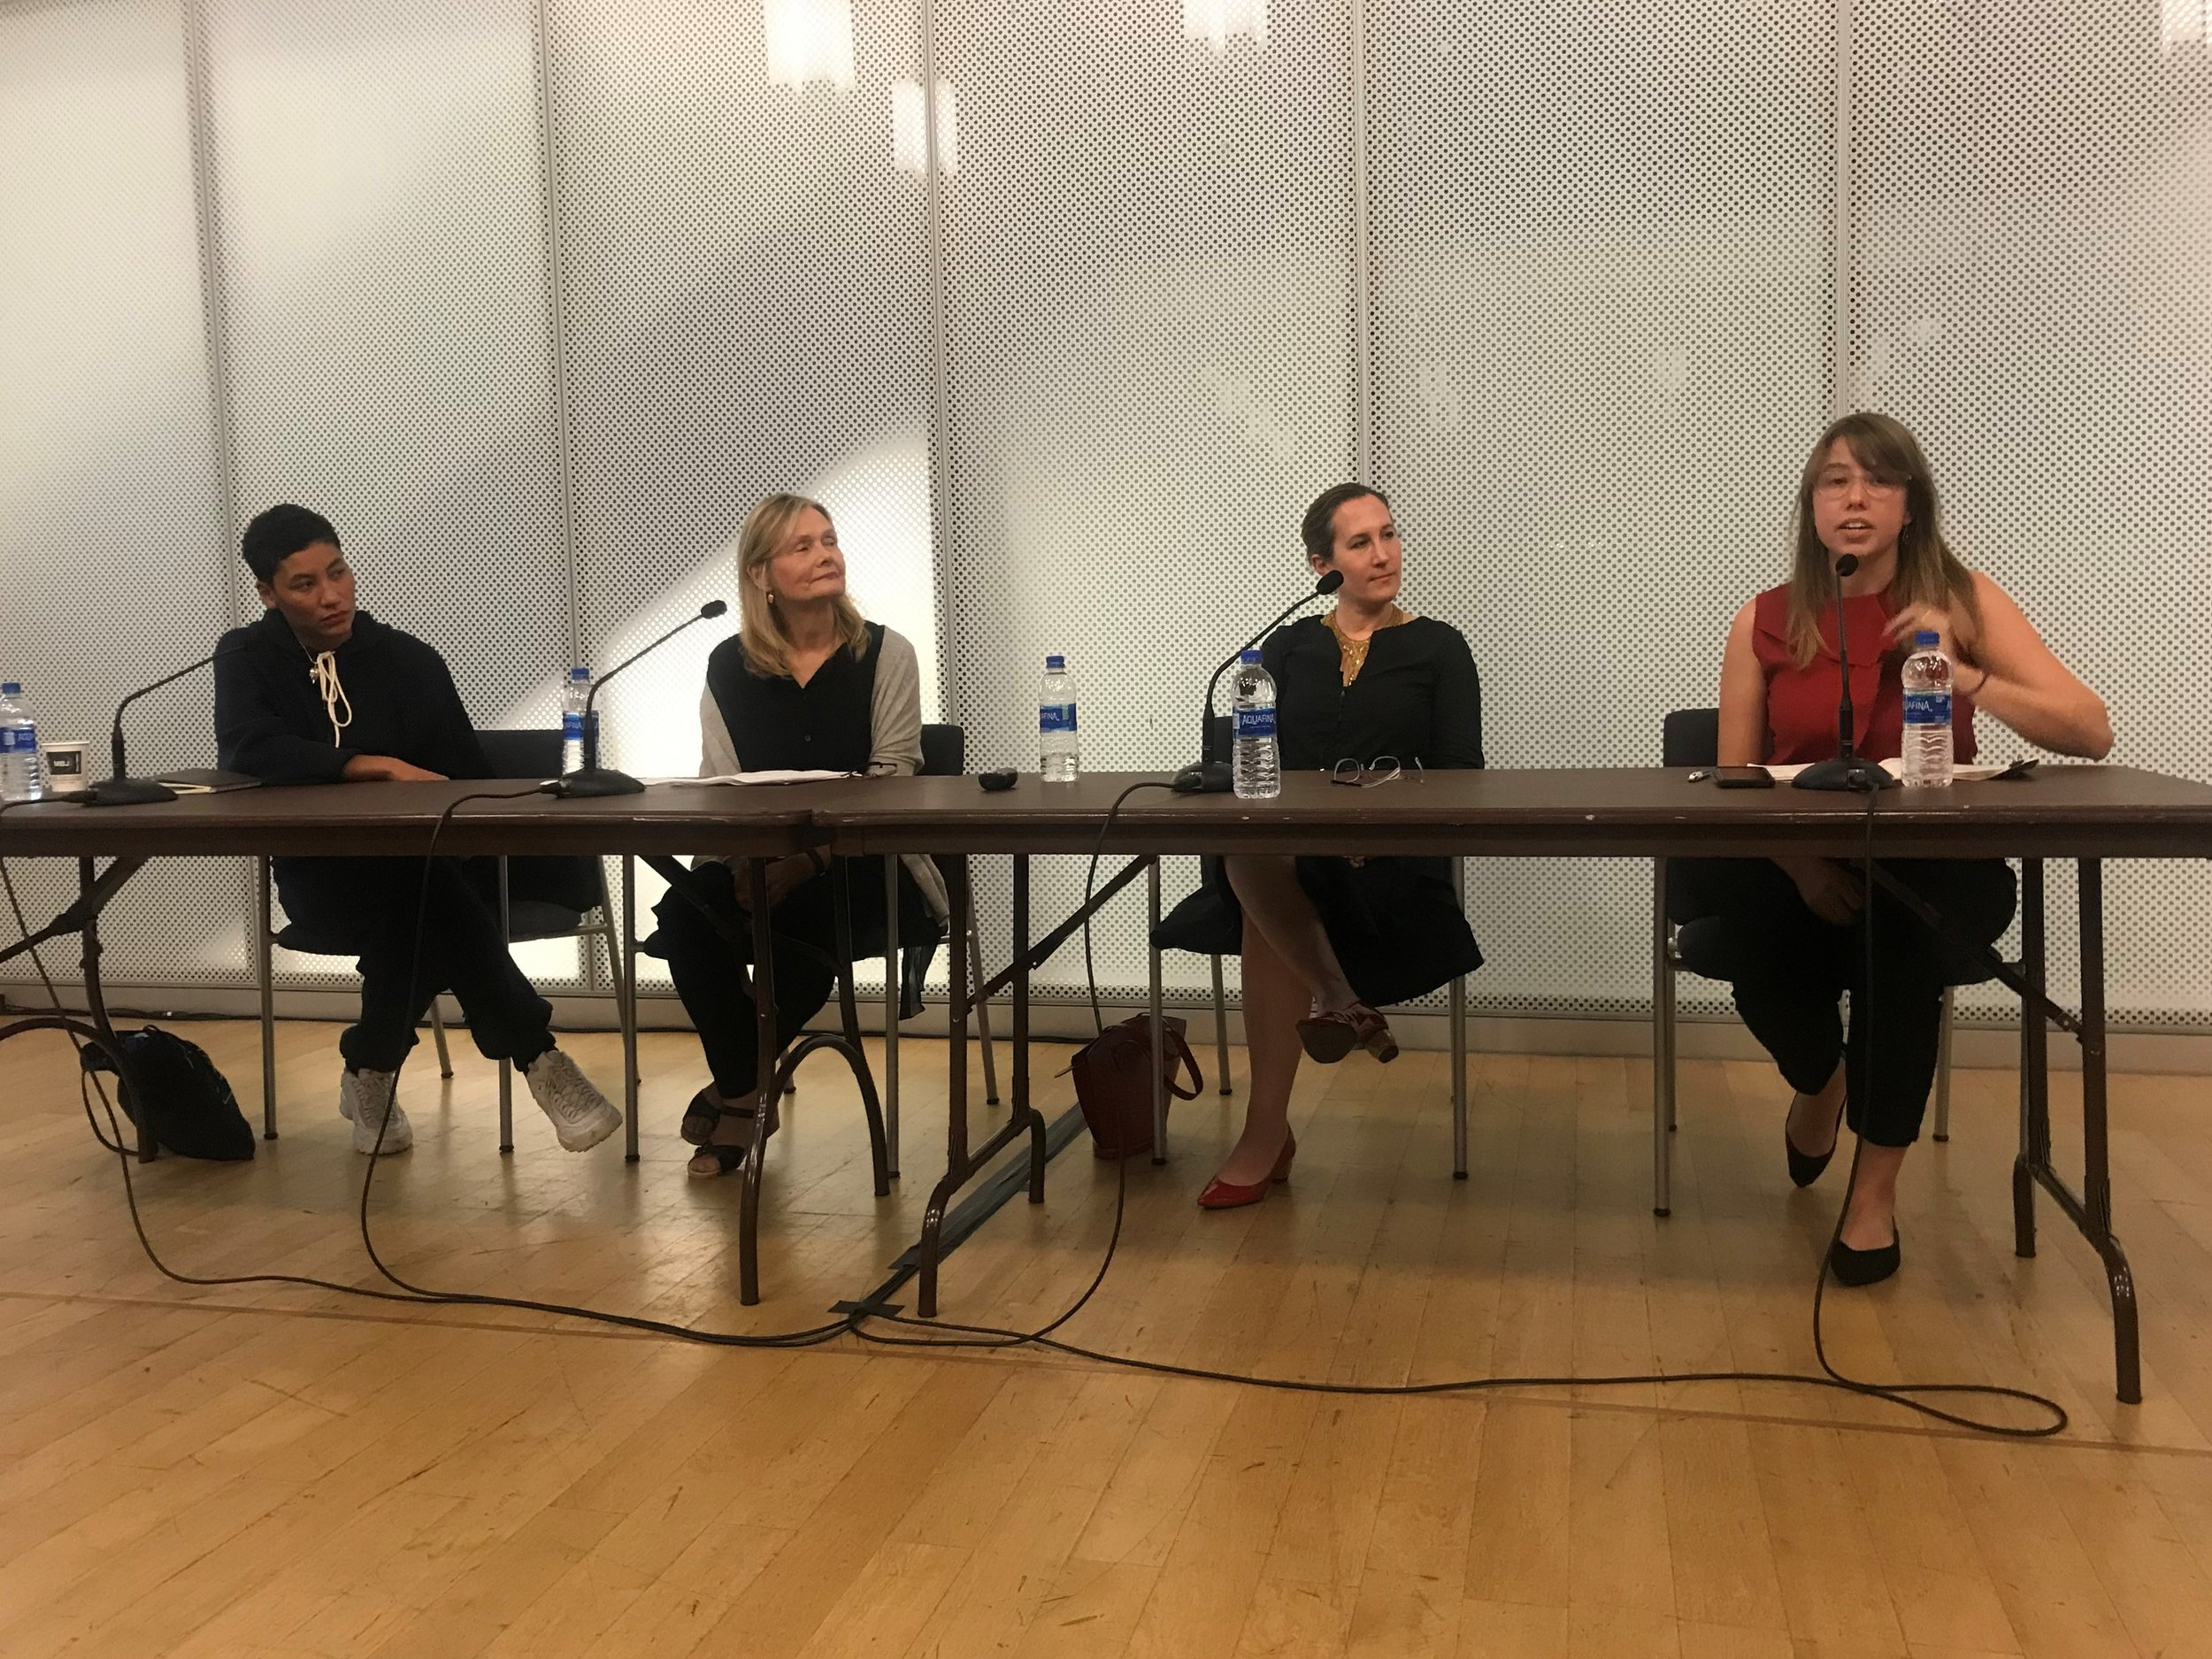 Naima Ramos Chapman, Kathleen Gilje, Natalie Frank, Carmen Hermo, The Un-Heroic Act_Symposium_Oct. 3 2018. Photo Monika Fabijanska